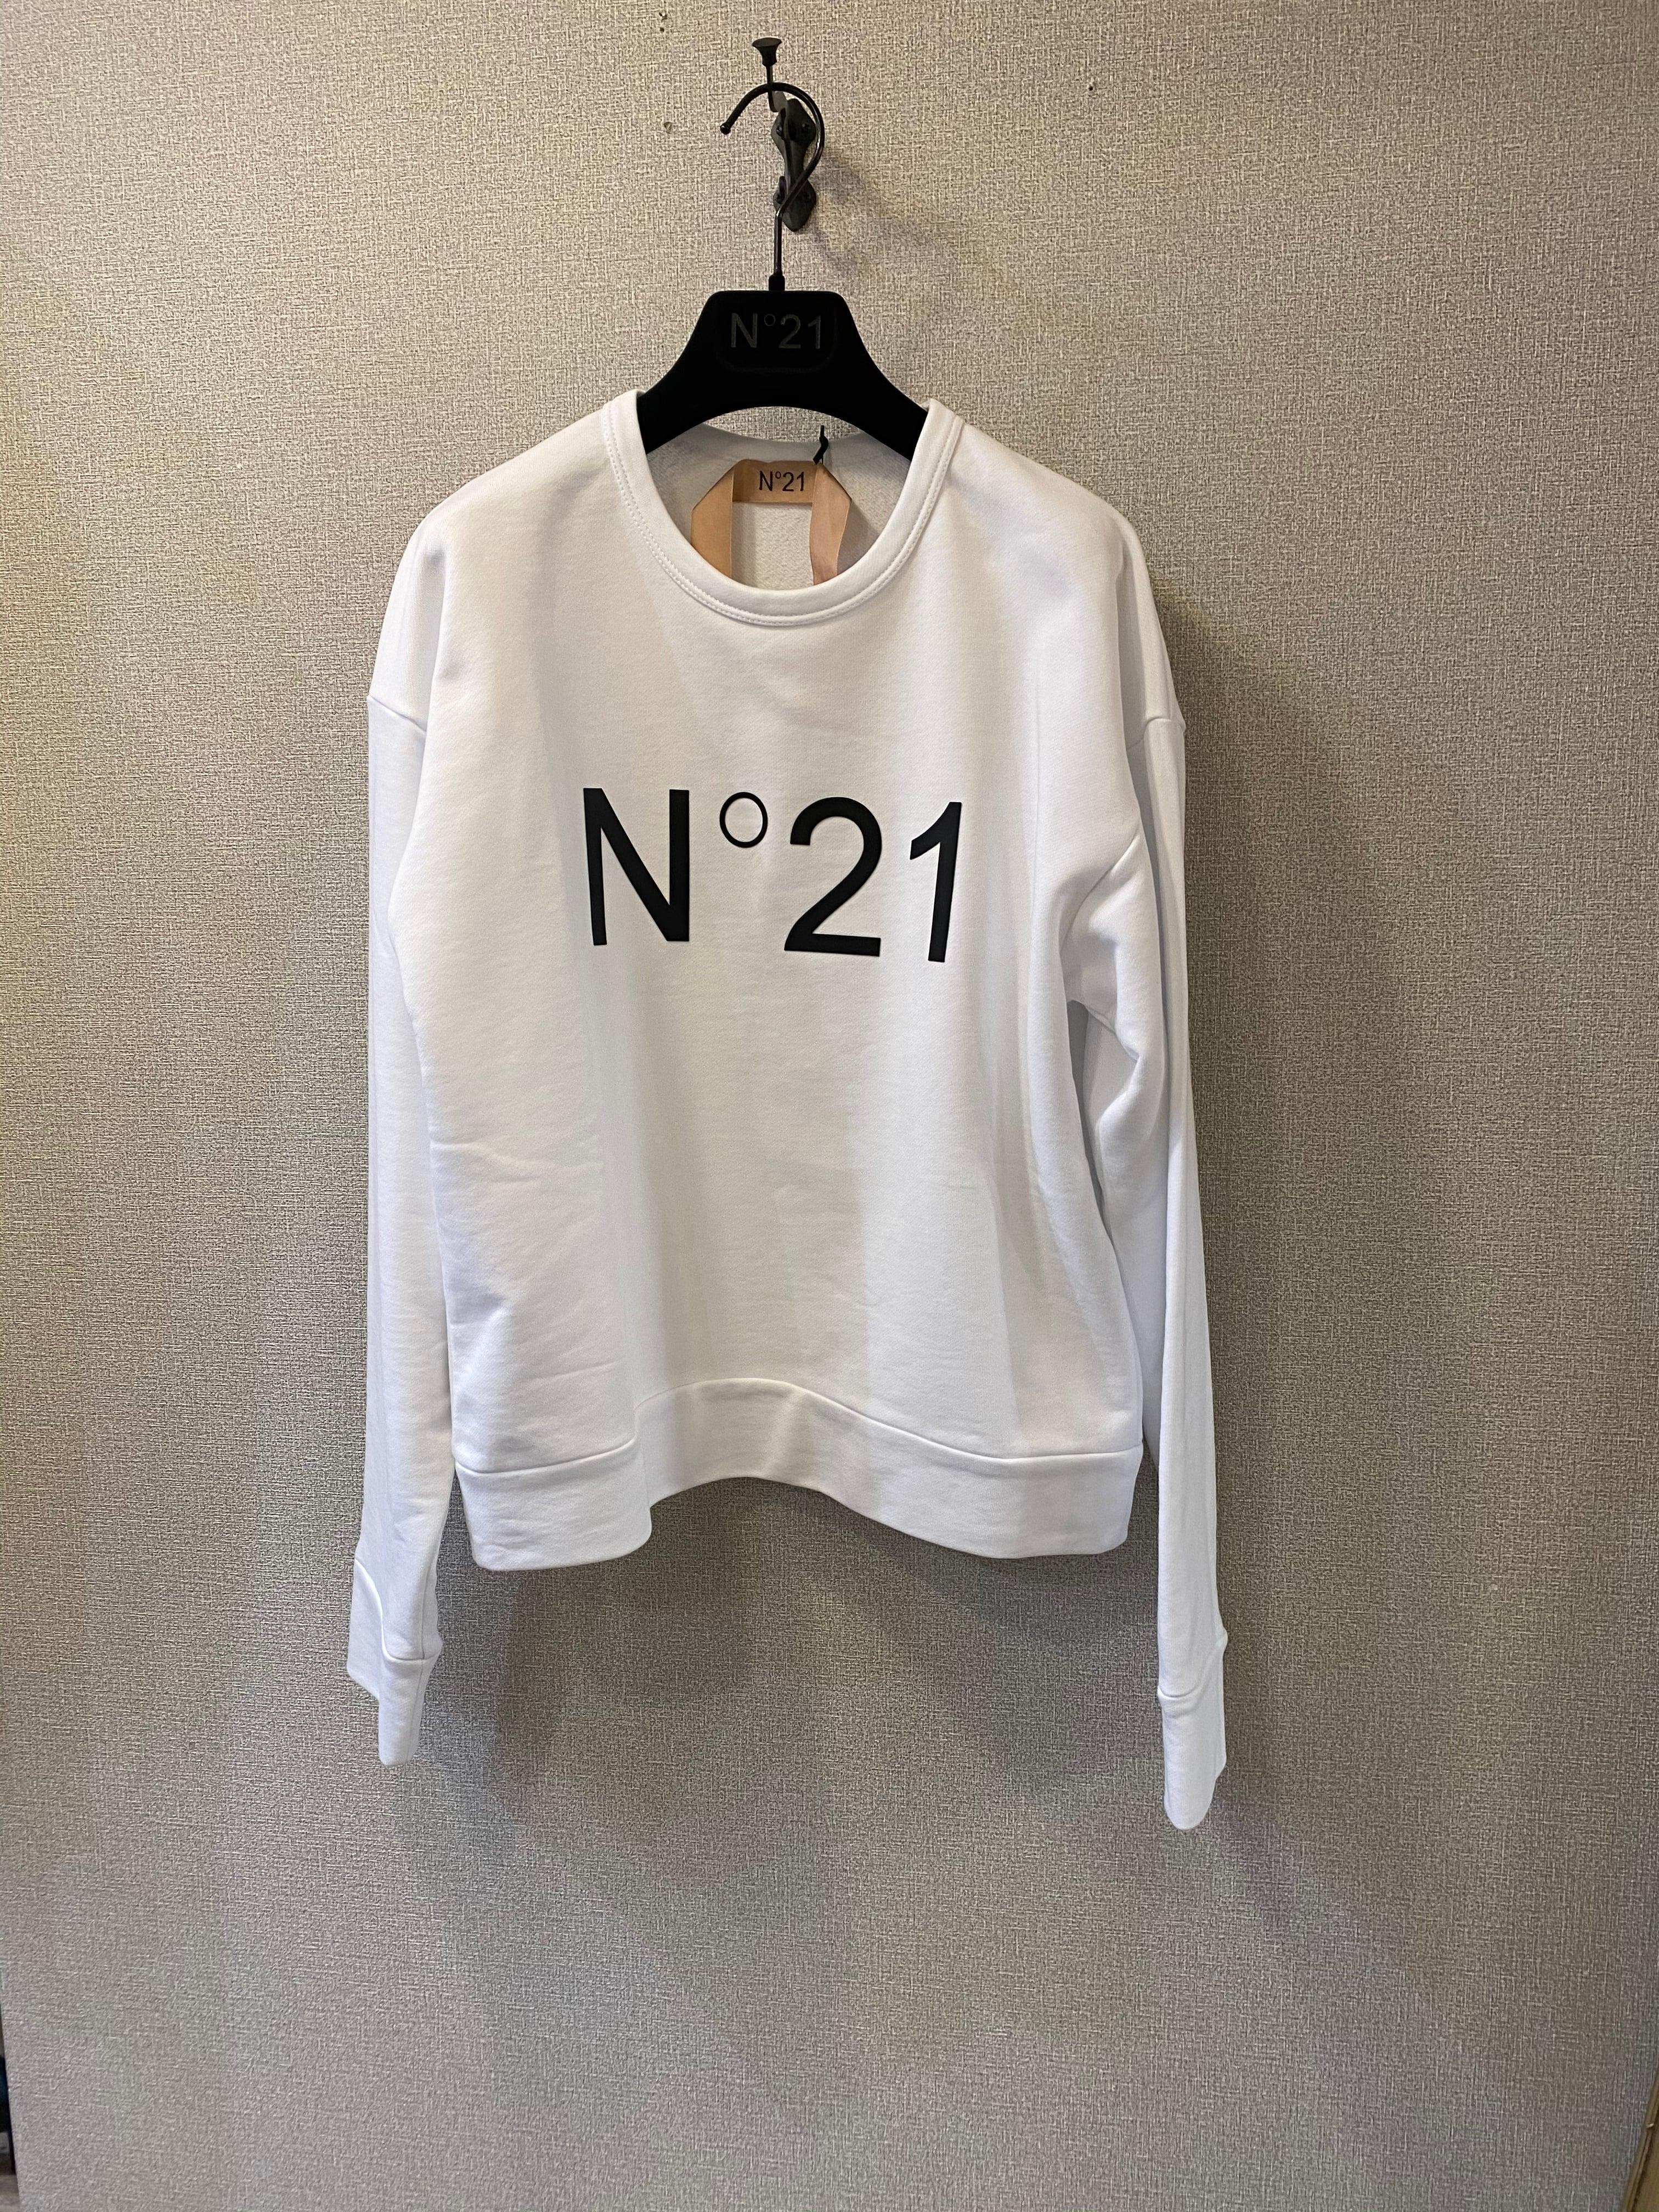 N°21 ロゴスエット 白